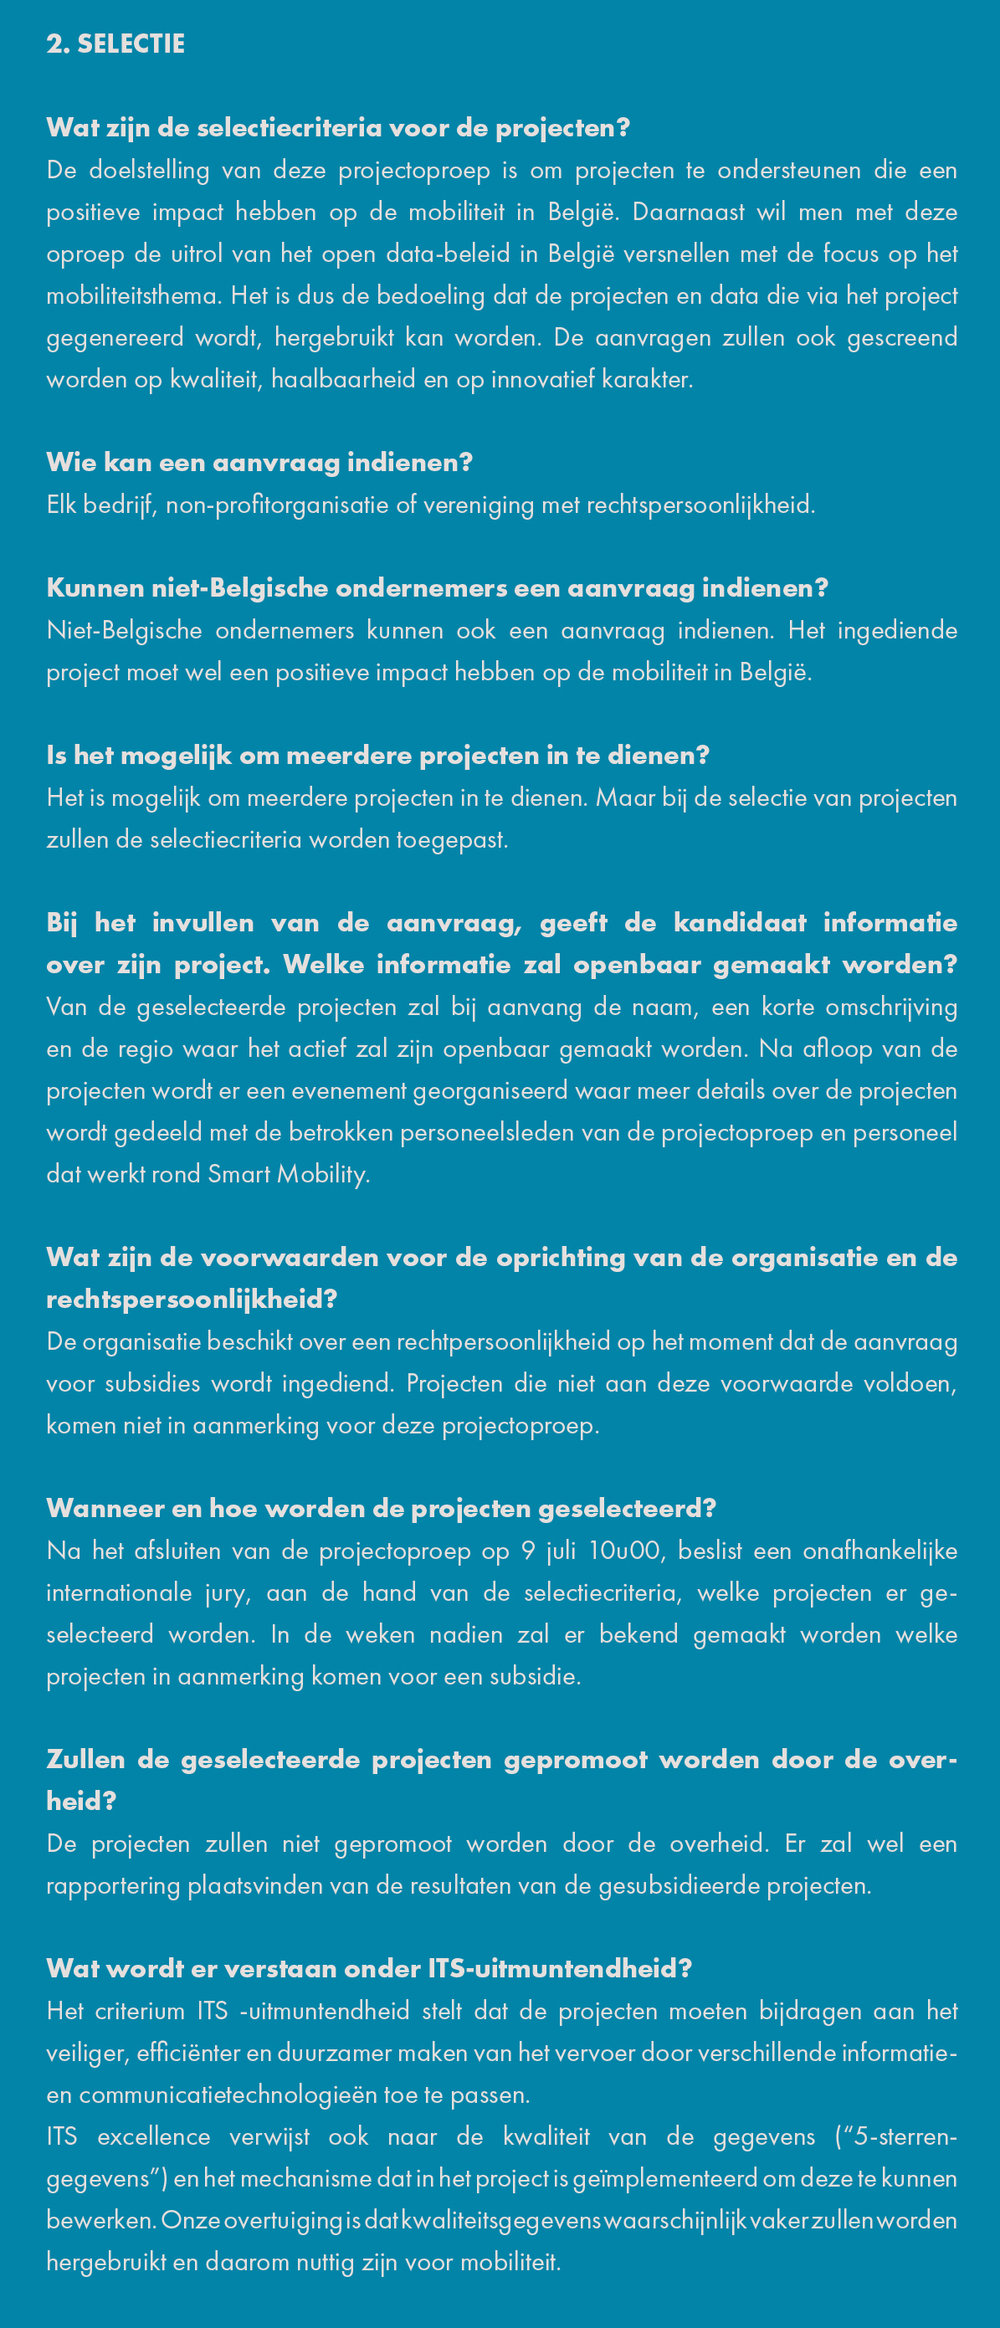 DELOITTE-SMB-TXTSELECTIEBLOK2-NL.jpg